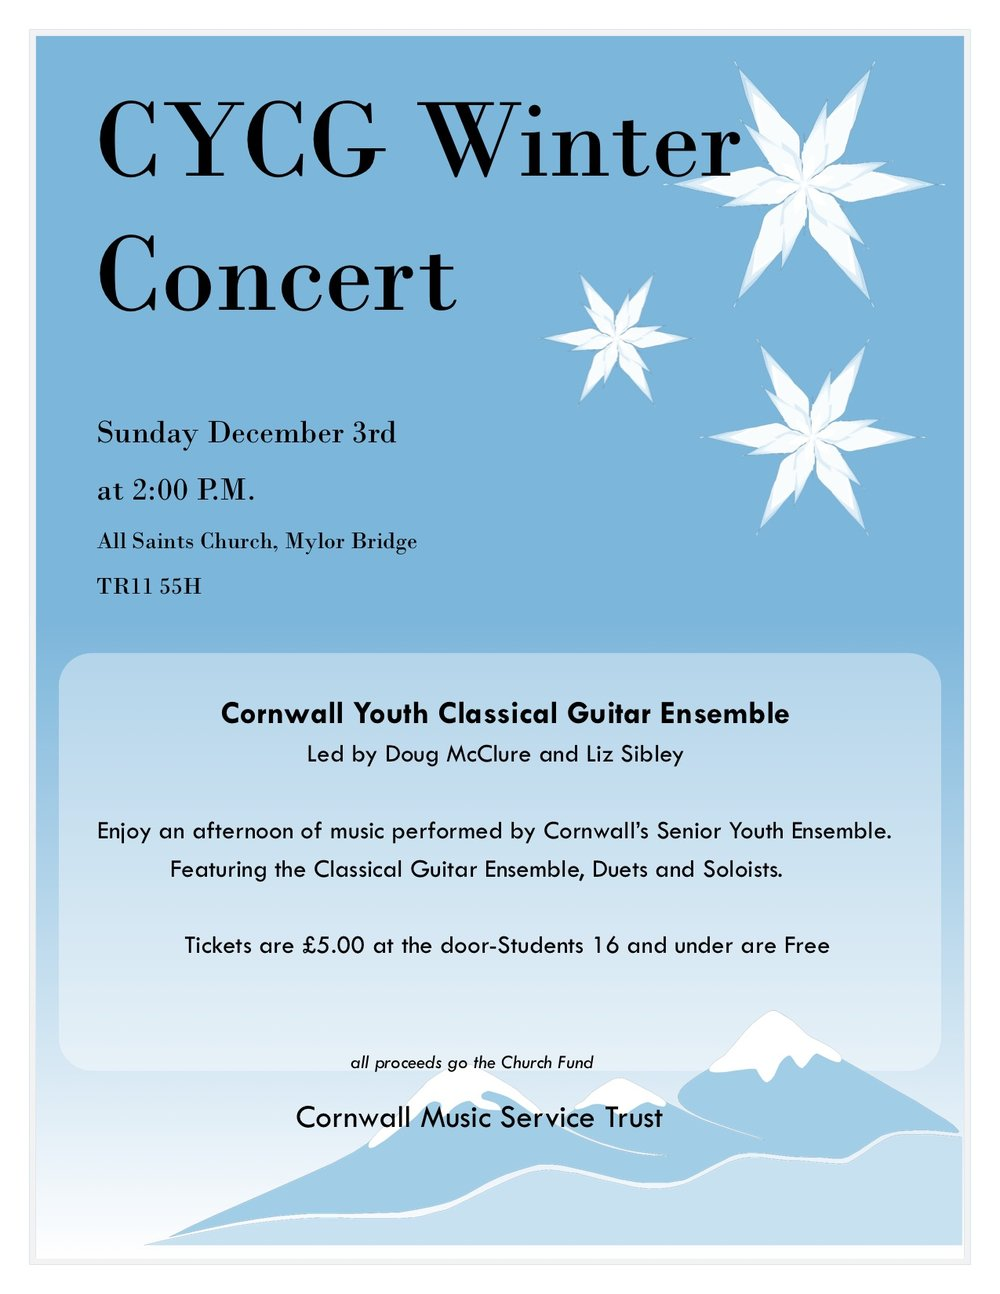 CYCG Winter Concert 2017.jpg